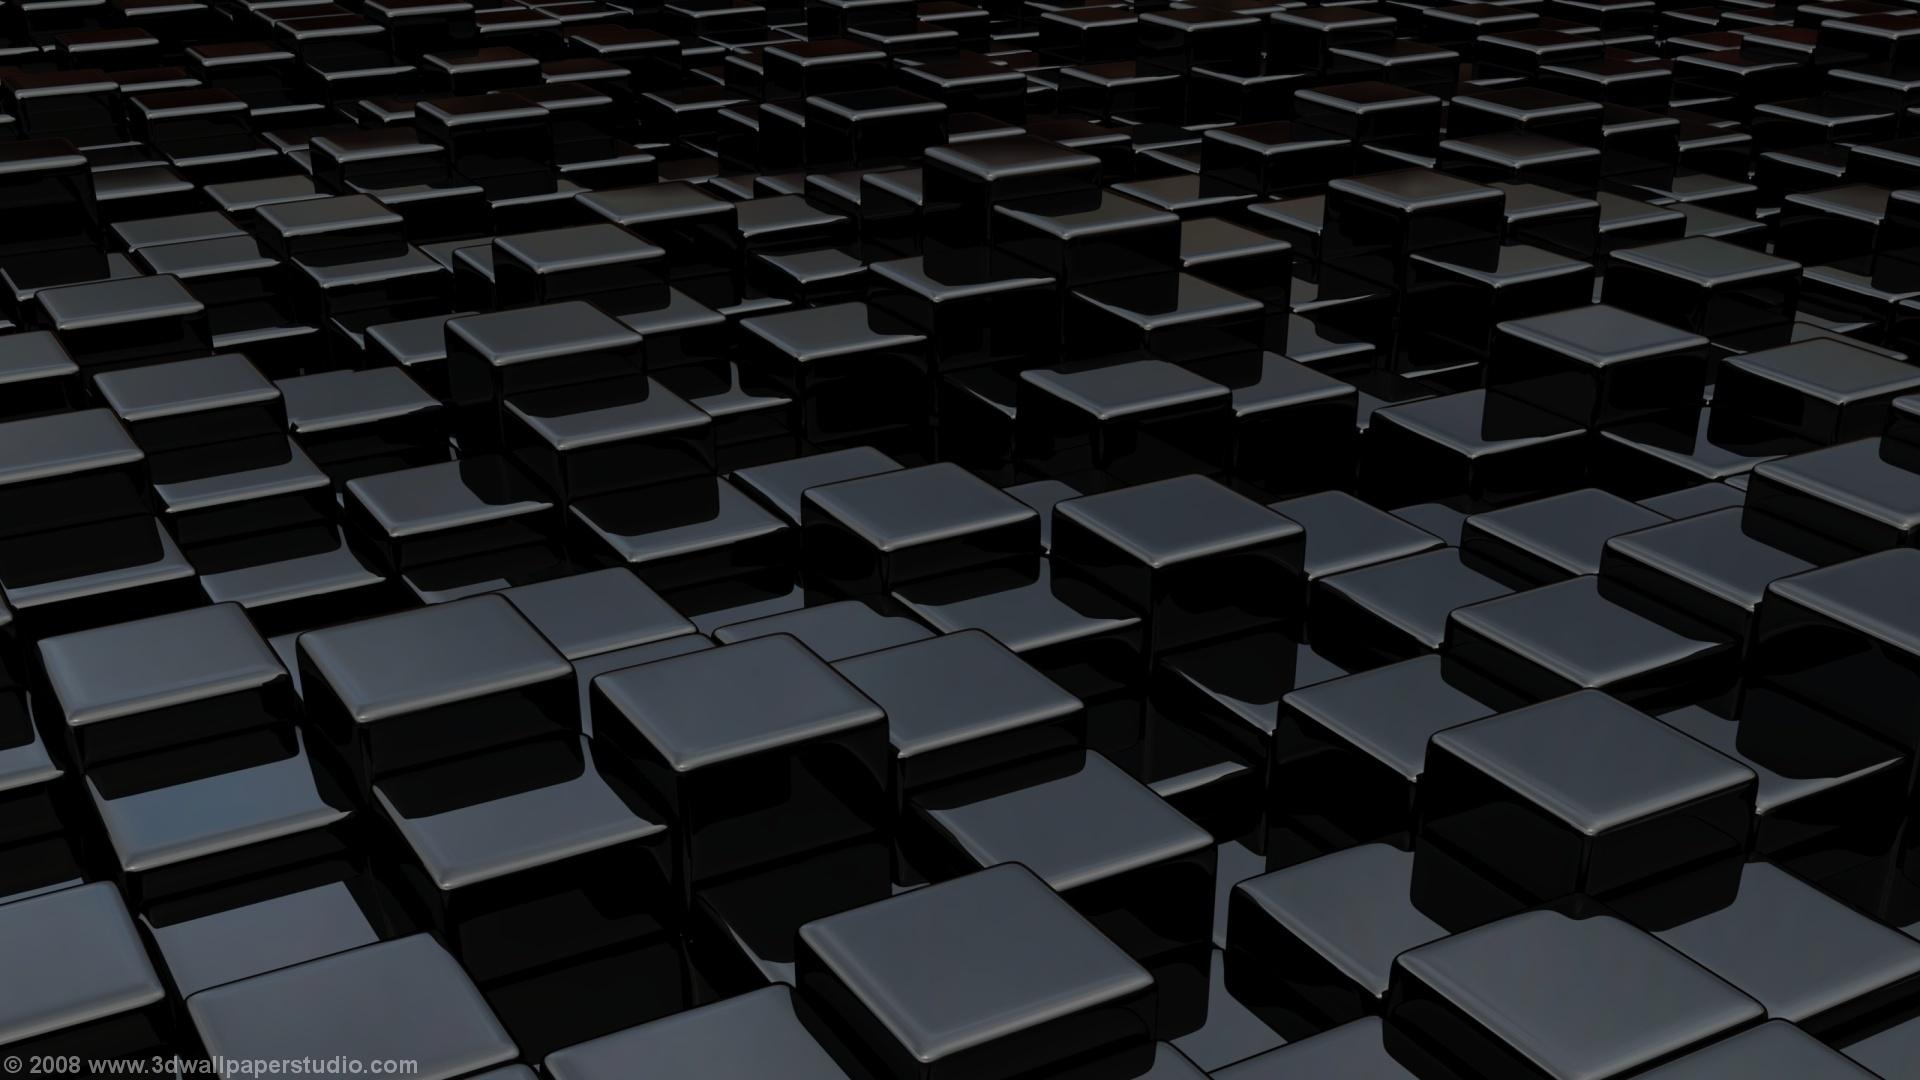 Pin 3d Wallpaper Black Cube World 1920 X 1080 1920x1080